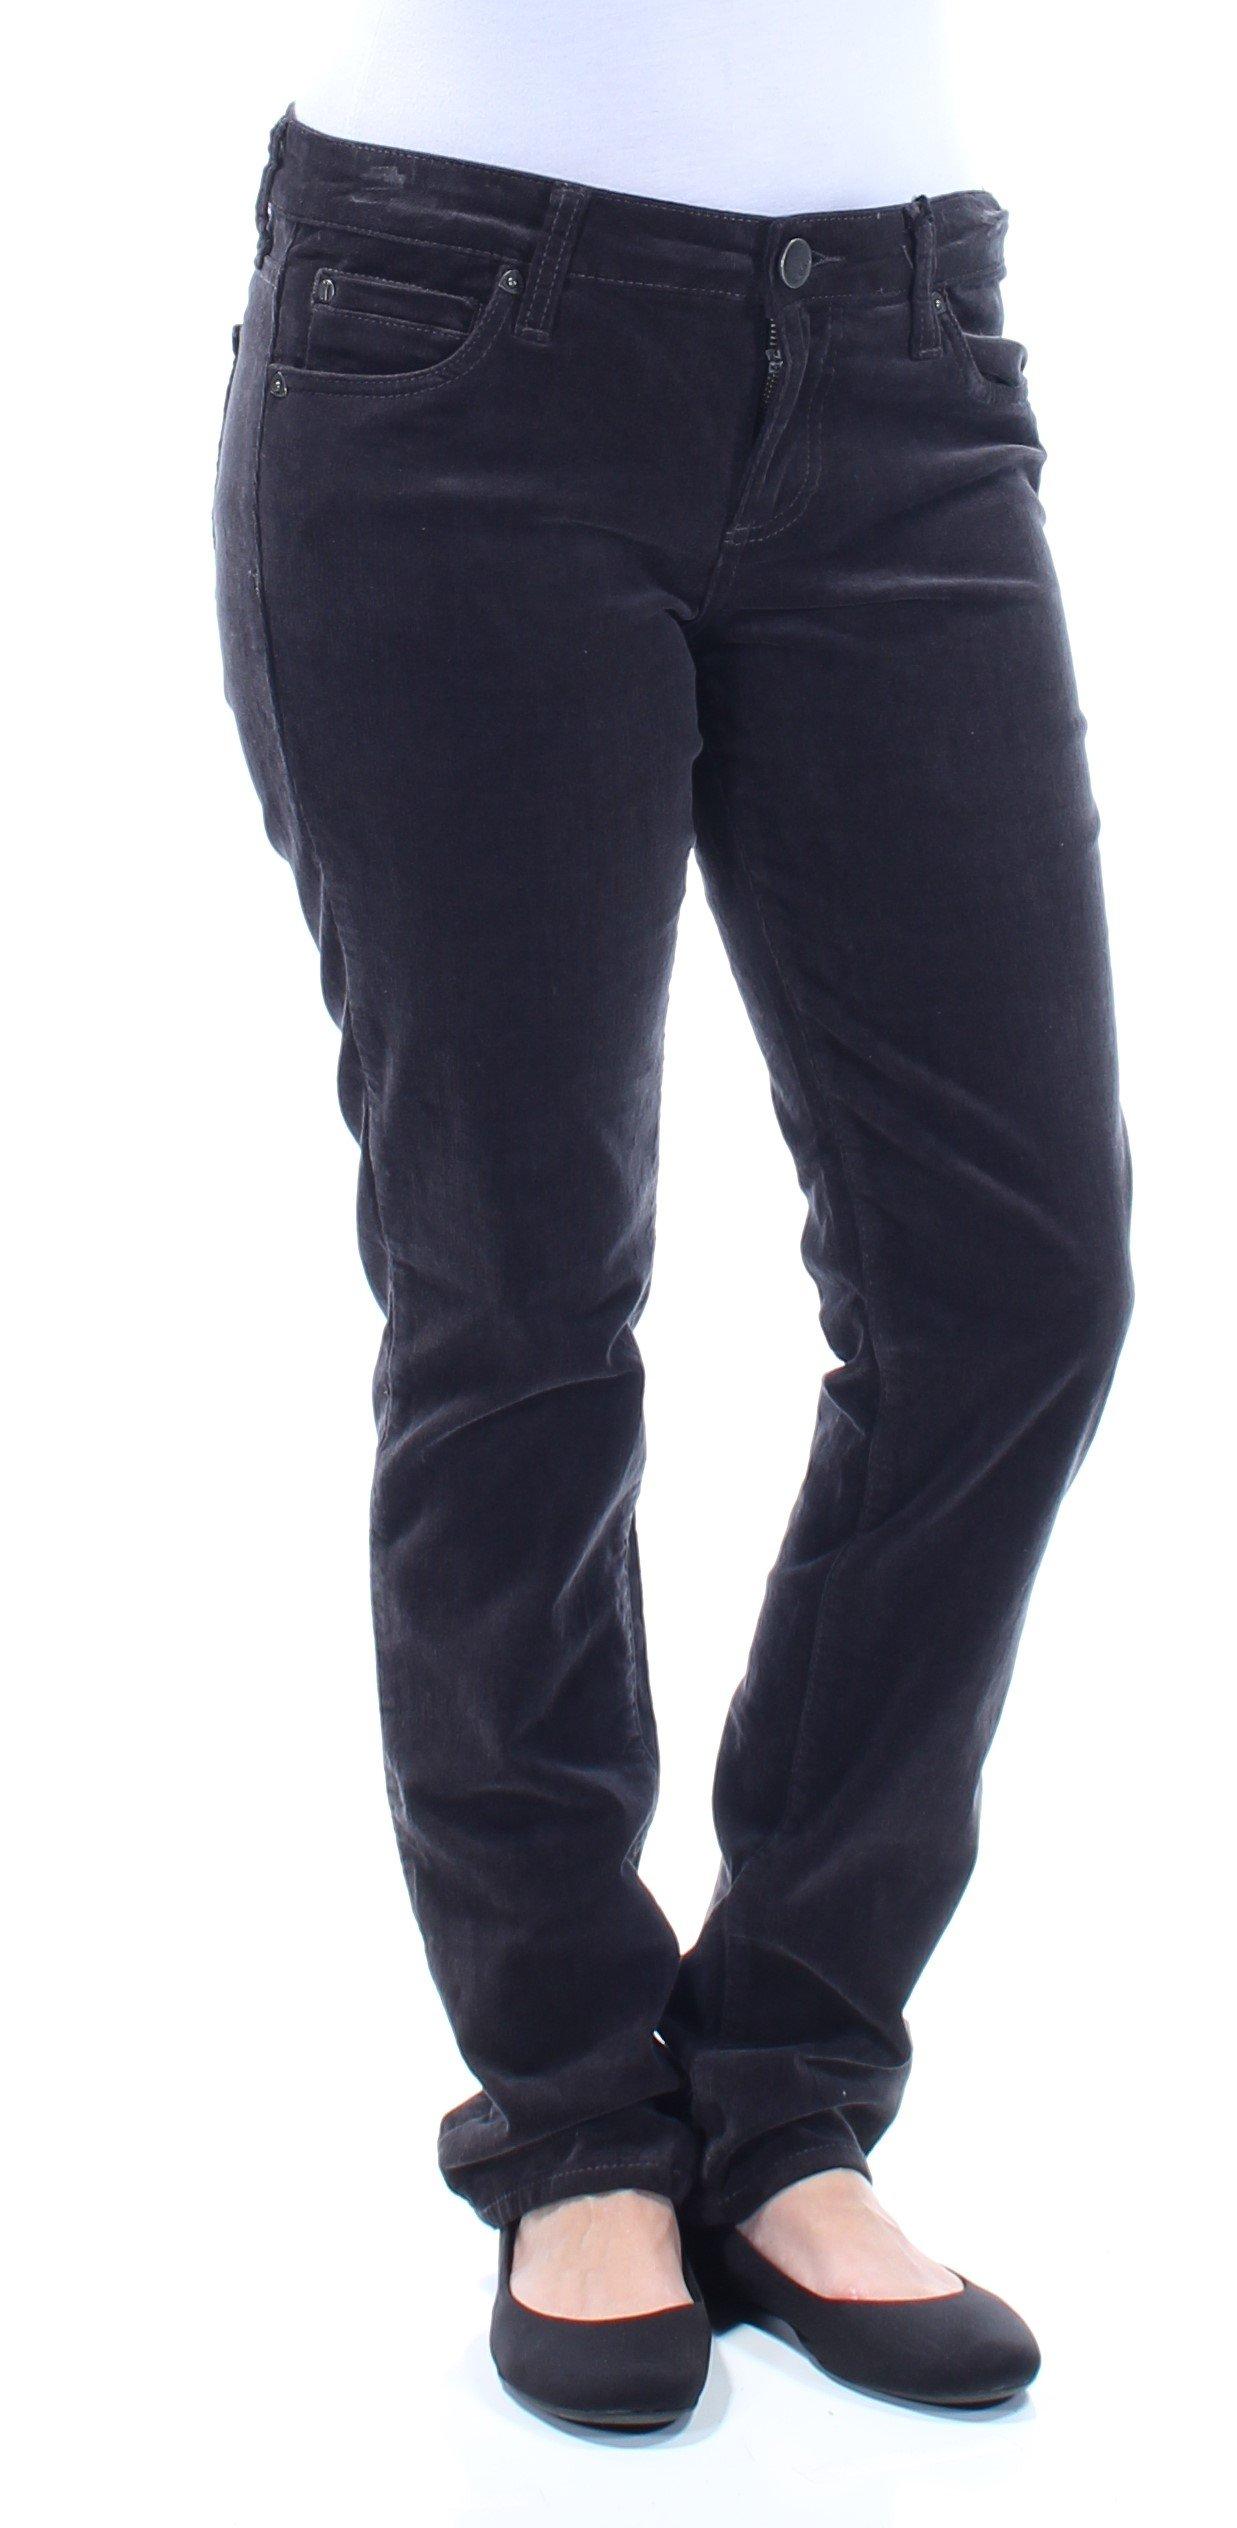 Kut From The Kloth Womens Boyfriend Corduroy Corduroy Pants Black 4